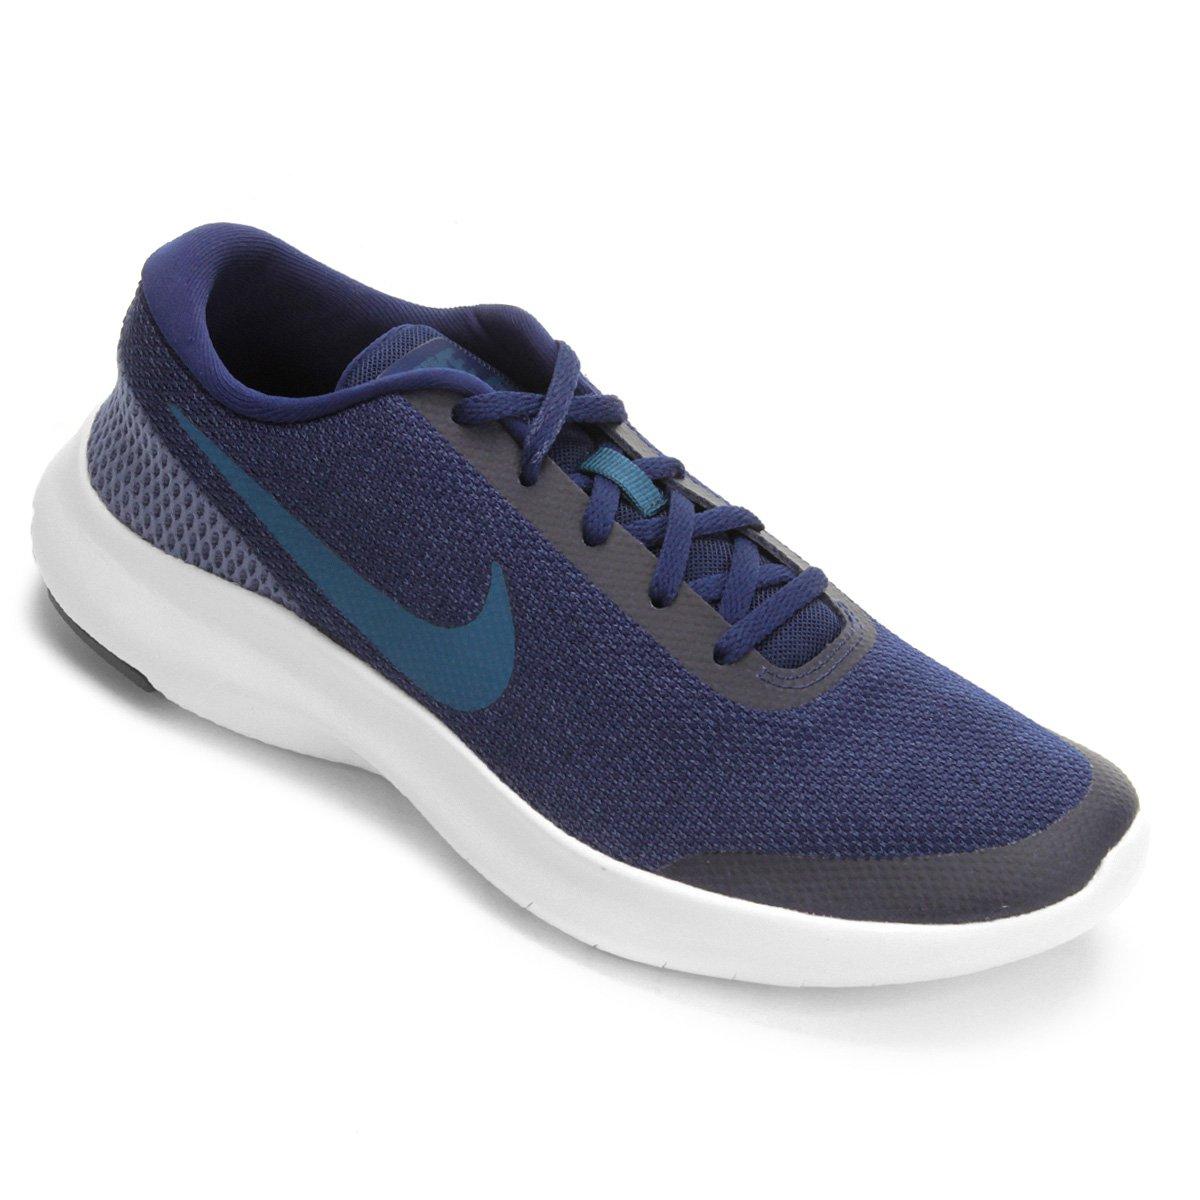 0e7148cc1b3 Tênis Nike Flex Experience RN 7 Masculino - Azul - Compre Agora ...